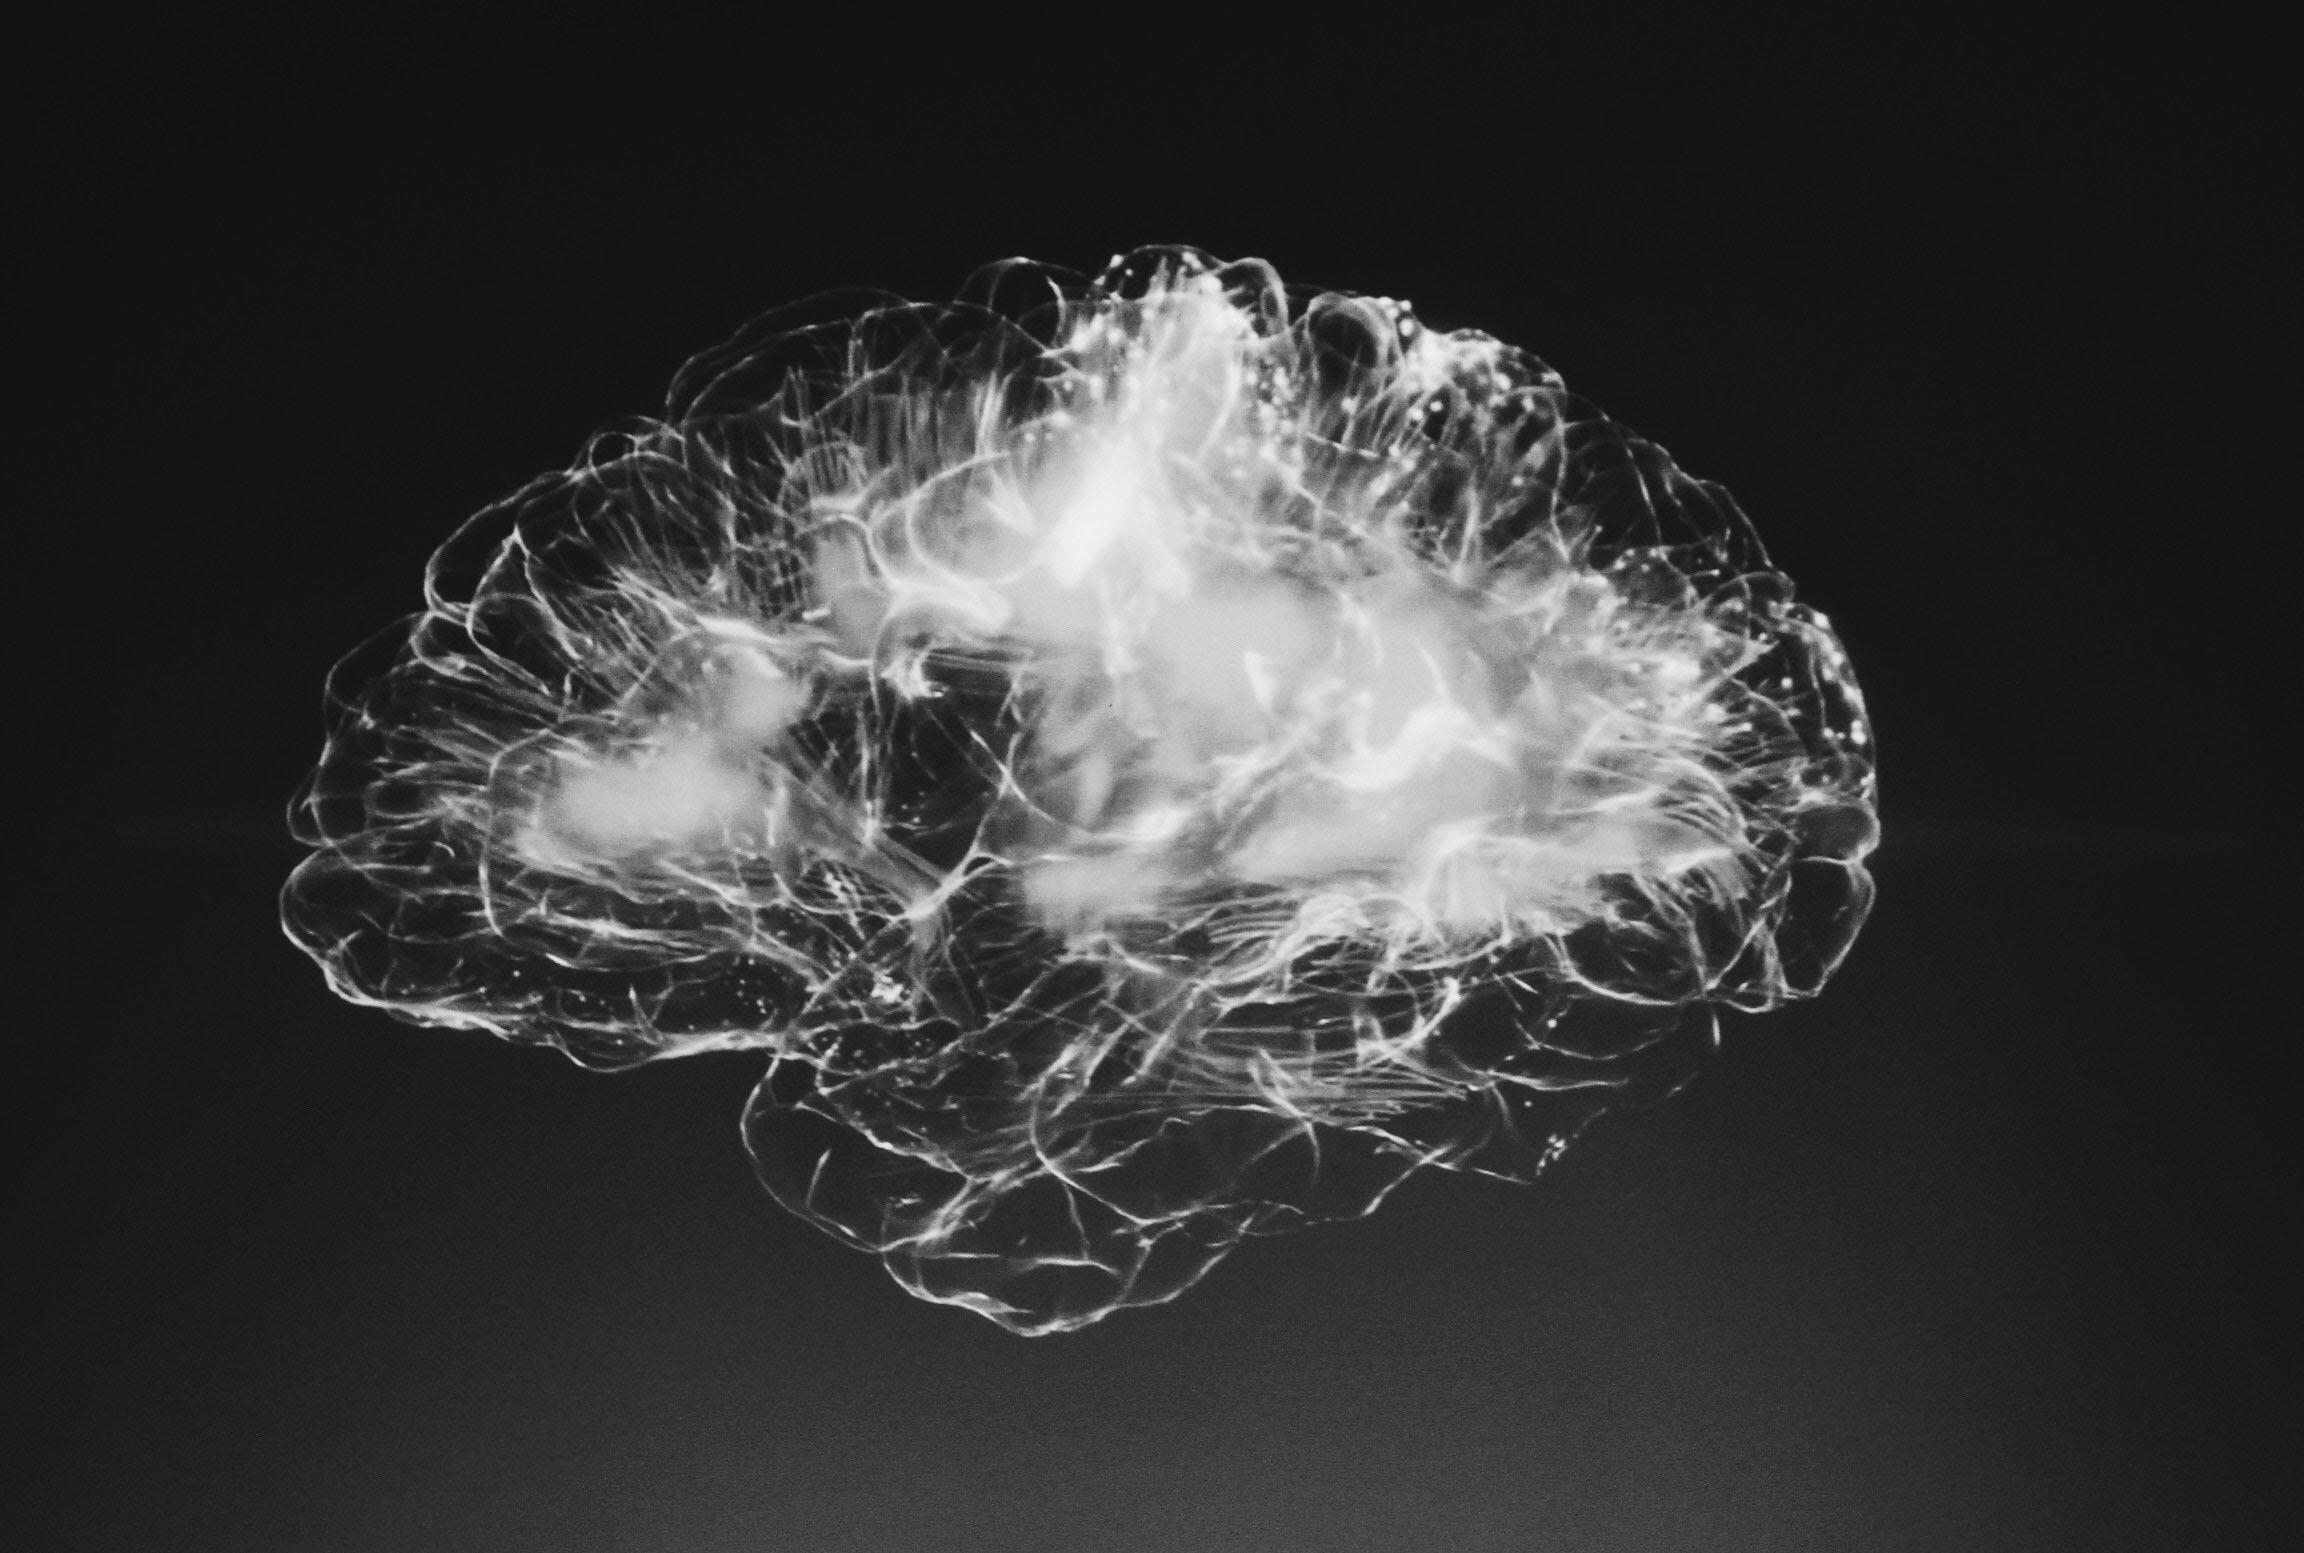 Craniosacral Therapy & Traumatic Brain Injury